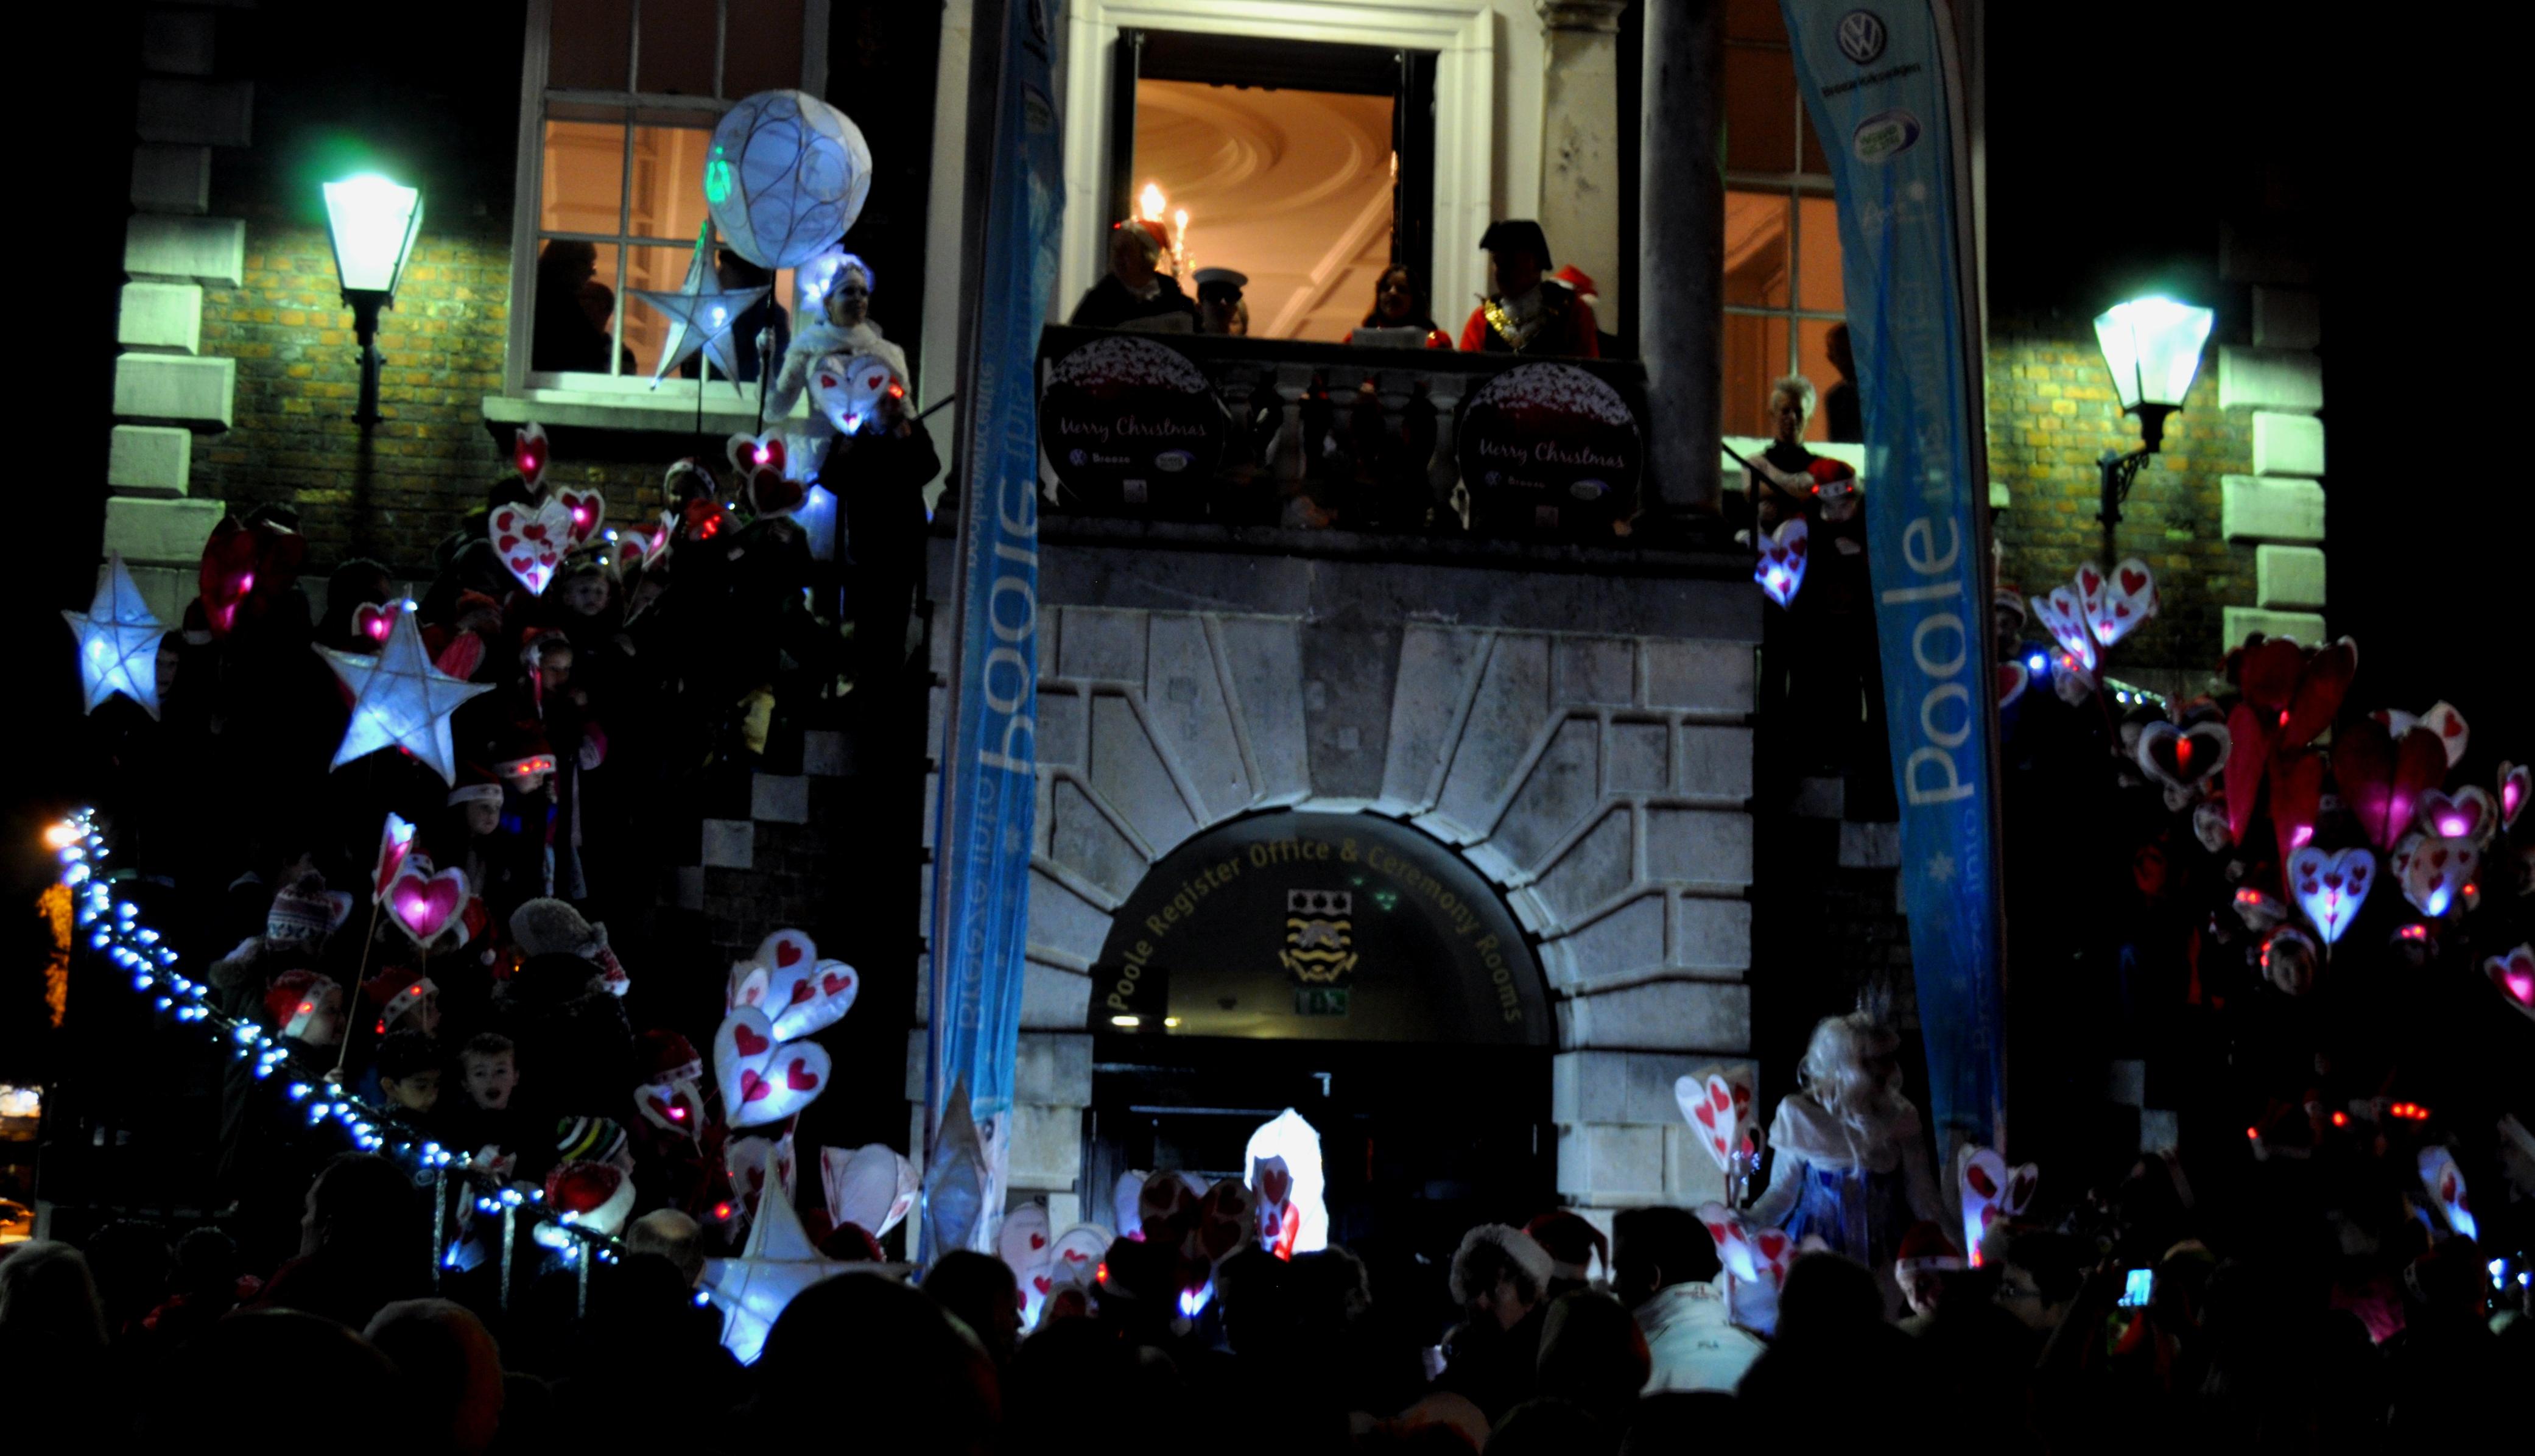 976Poole Lantern Procession